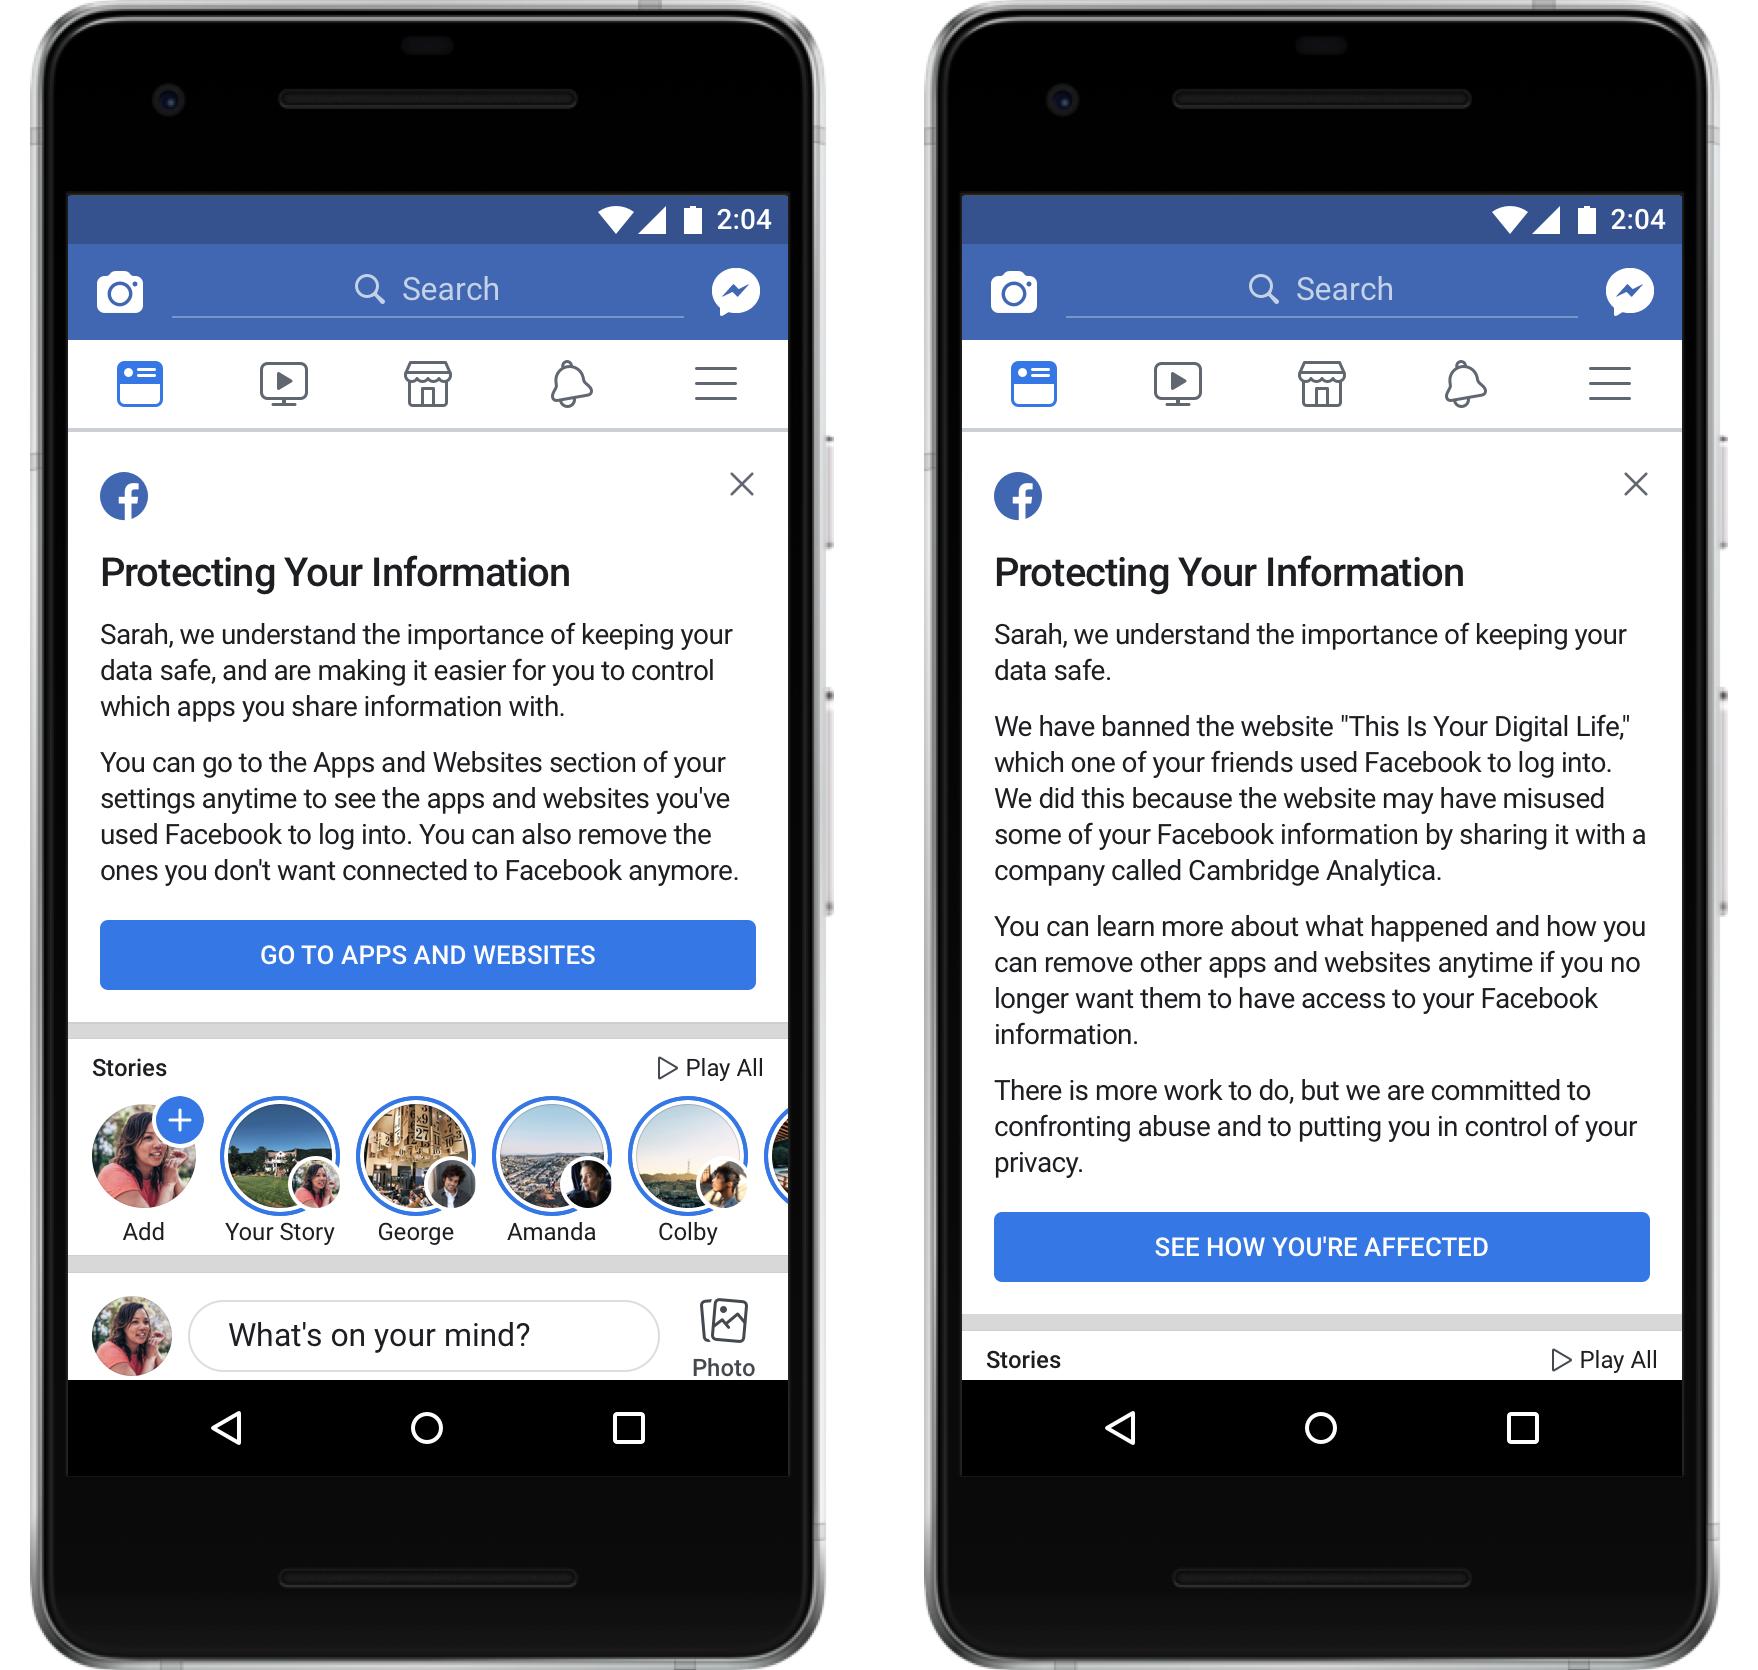 Facebook and Instagram make big changes to APIs after